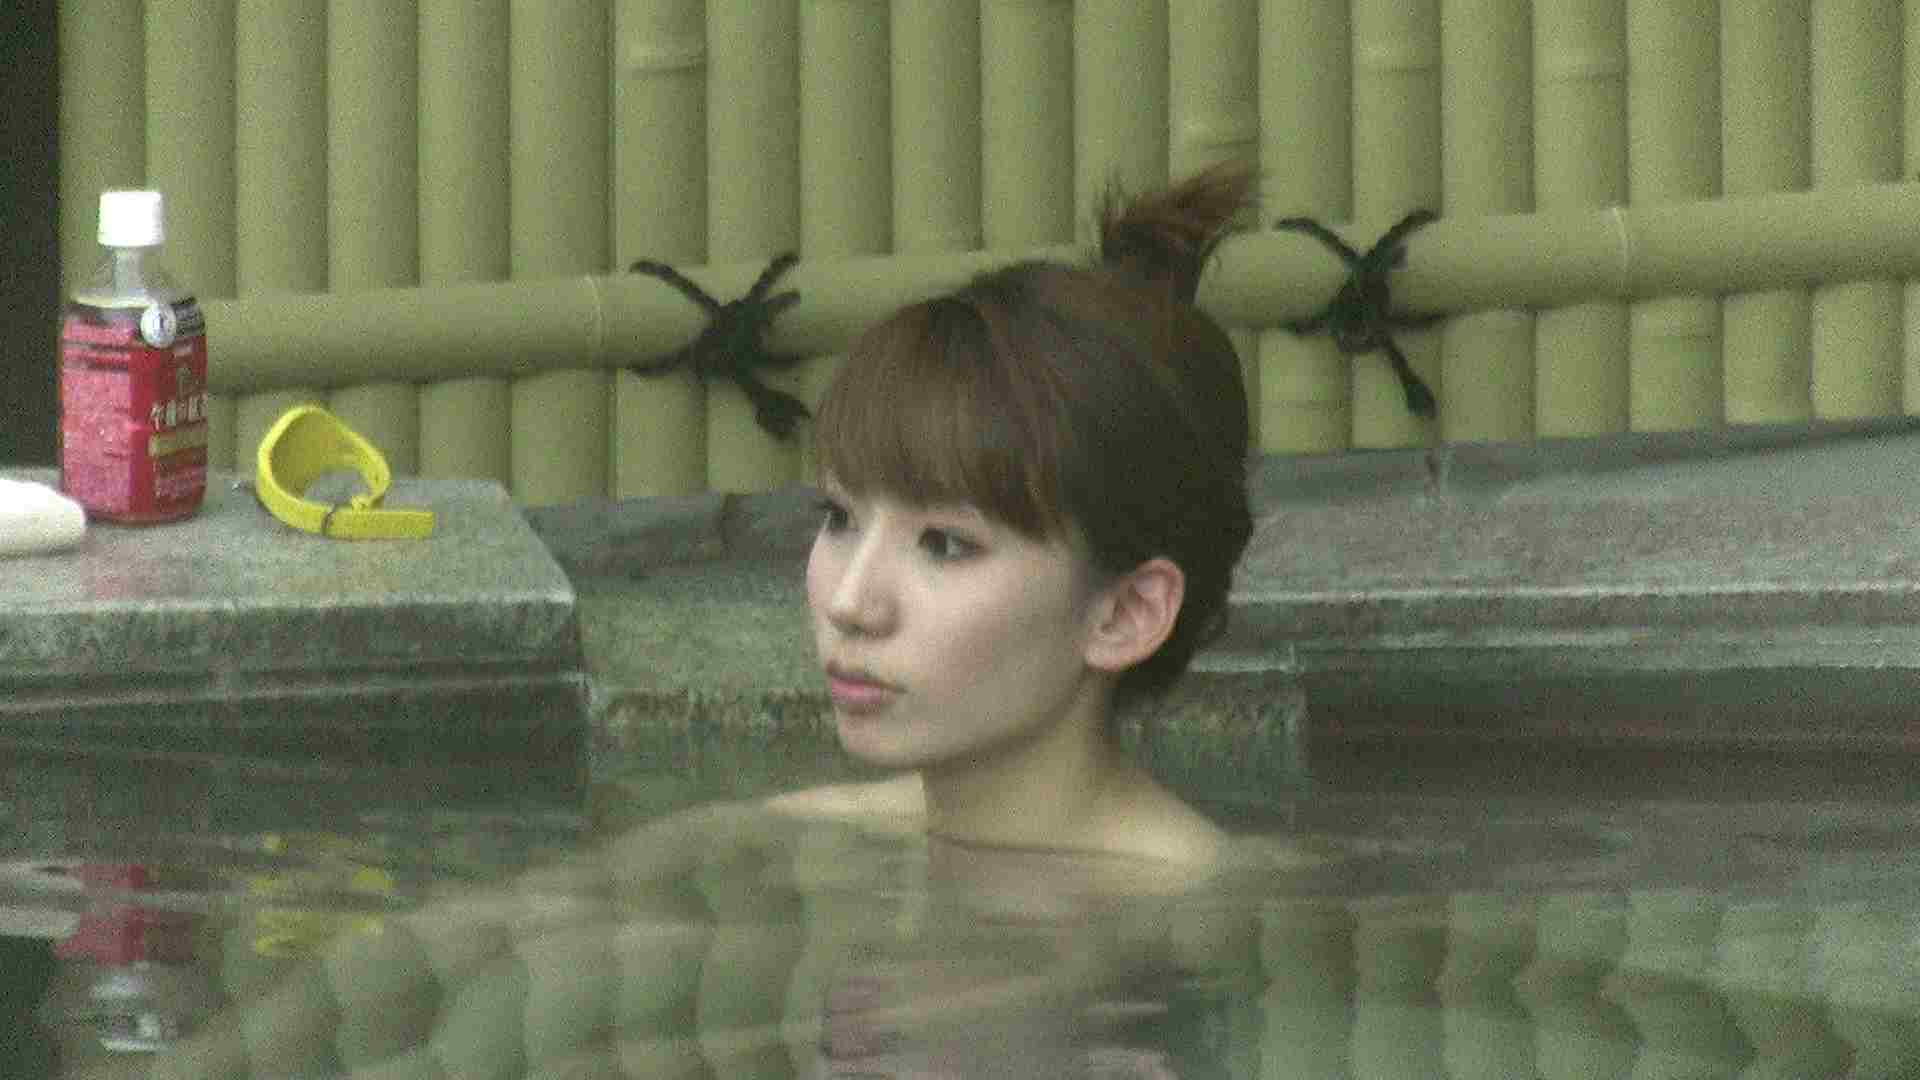 Aquaな露天風呂Vol.208 0 | 0  78連発 27